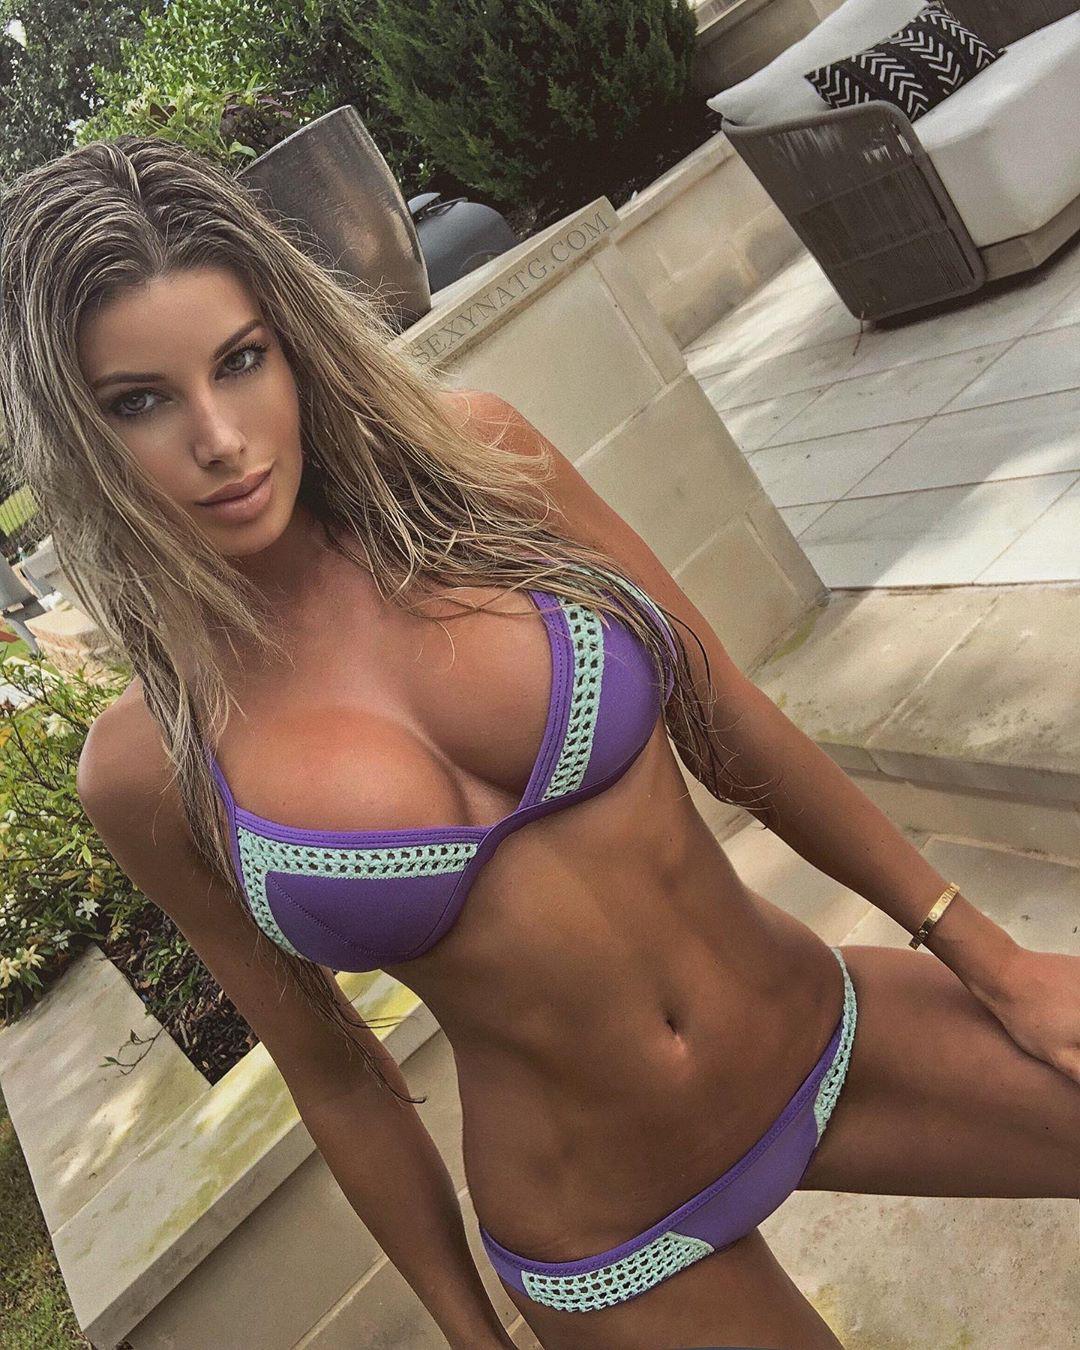 Natalie Gauvreau lingerie, bikini swimsuit top, swimwear matching dress